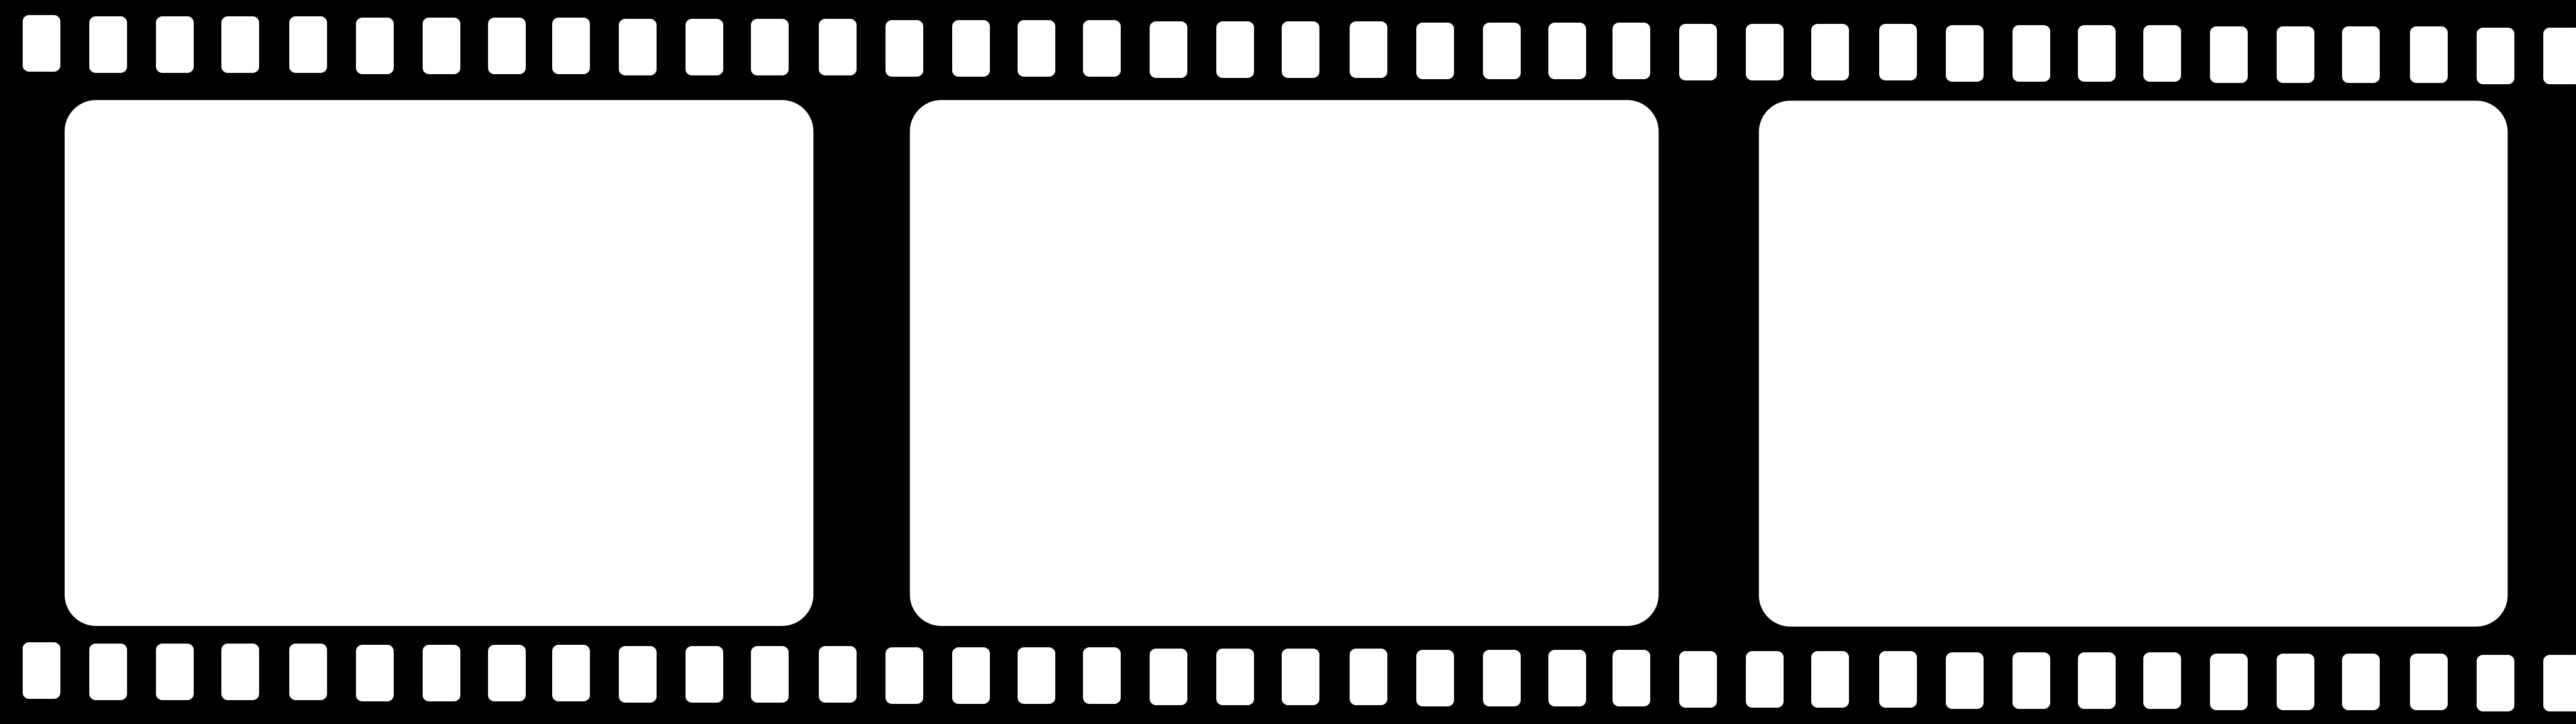 MOVIE FILM IMGUST 4096x1152